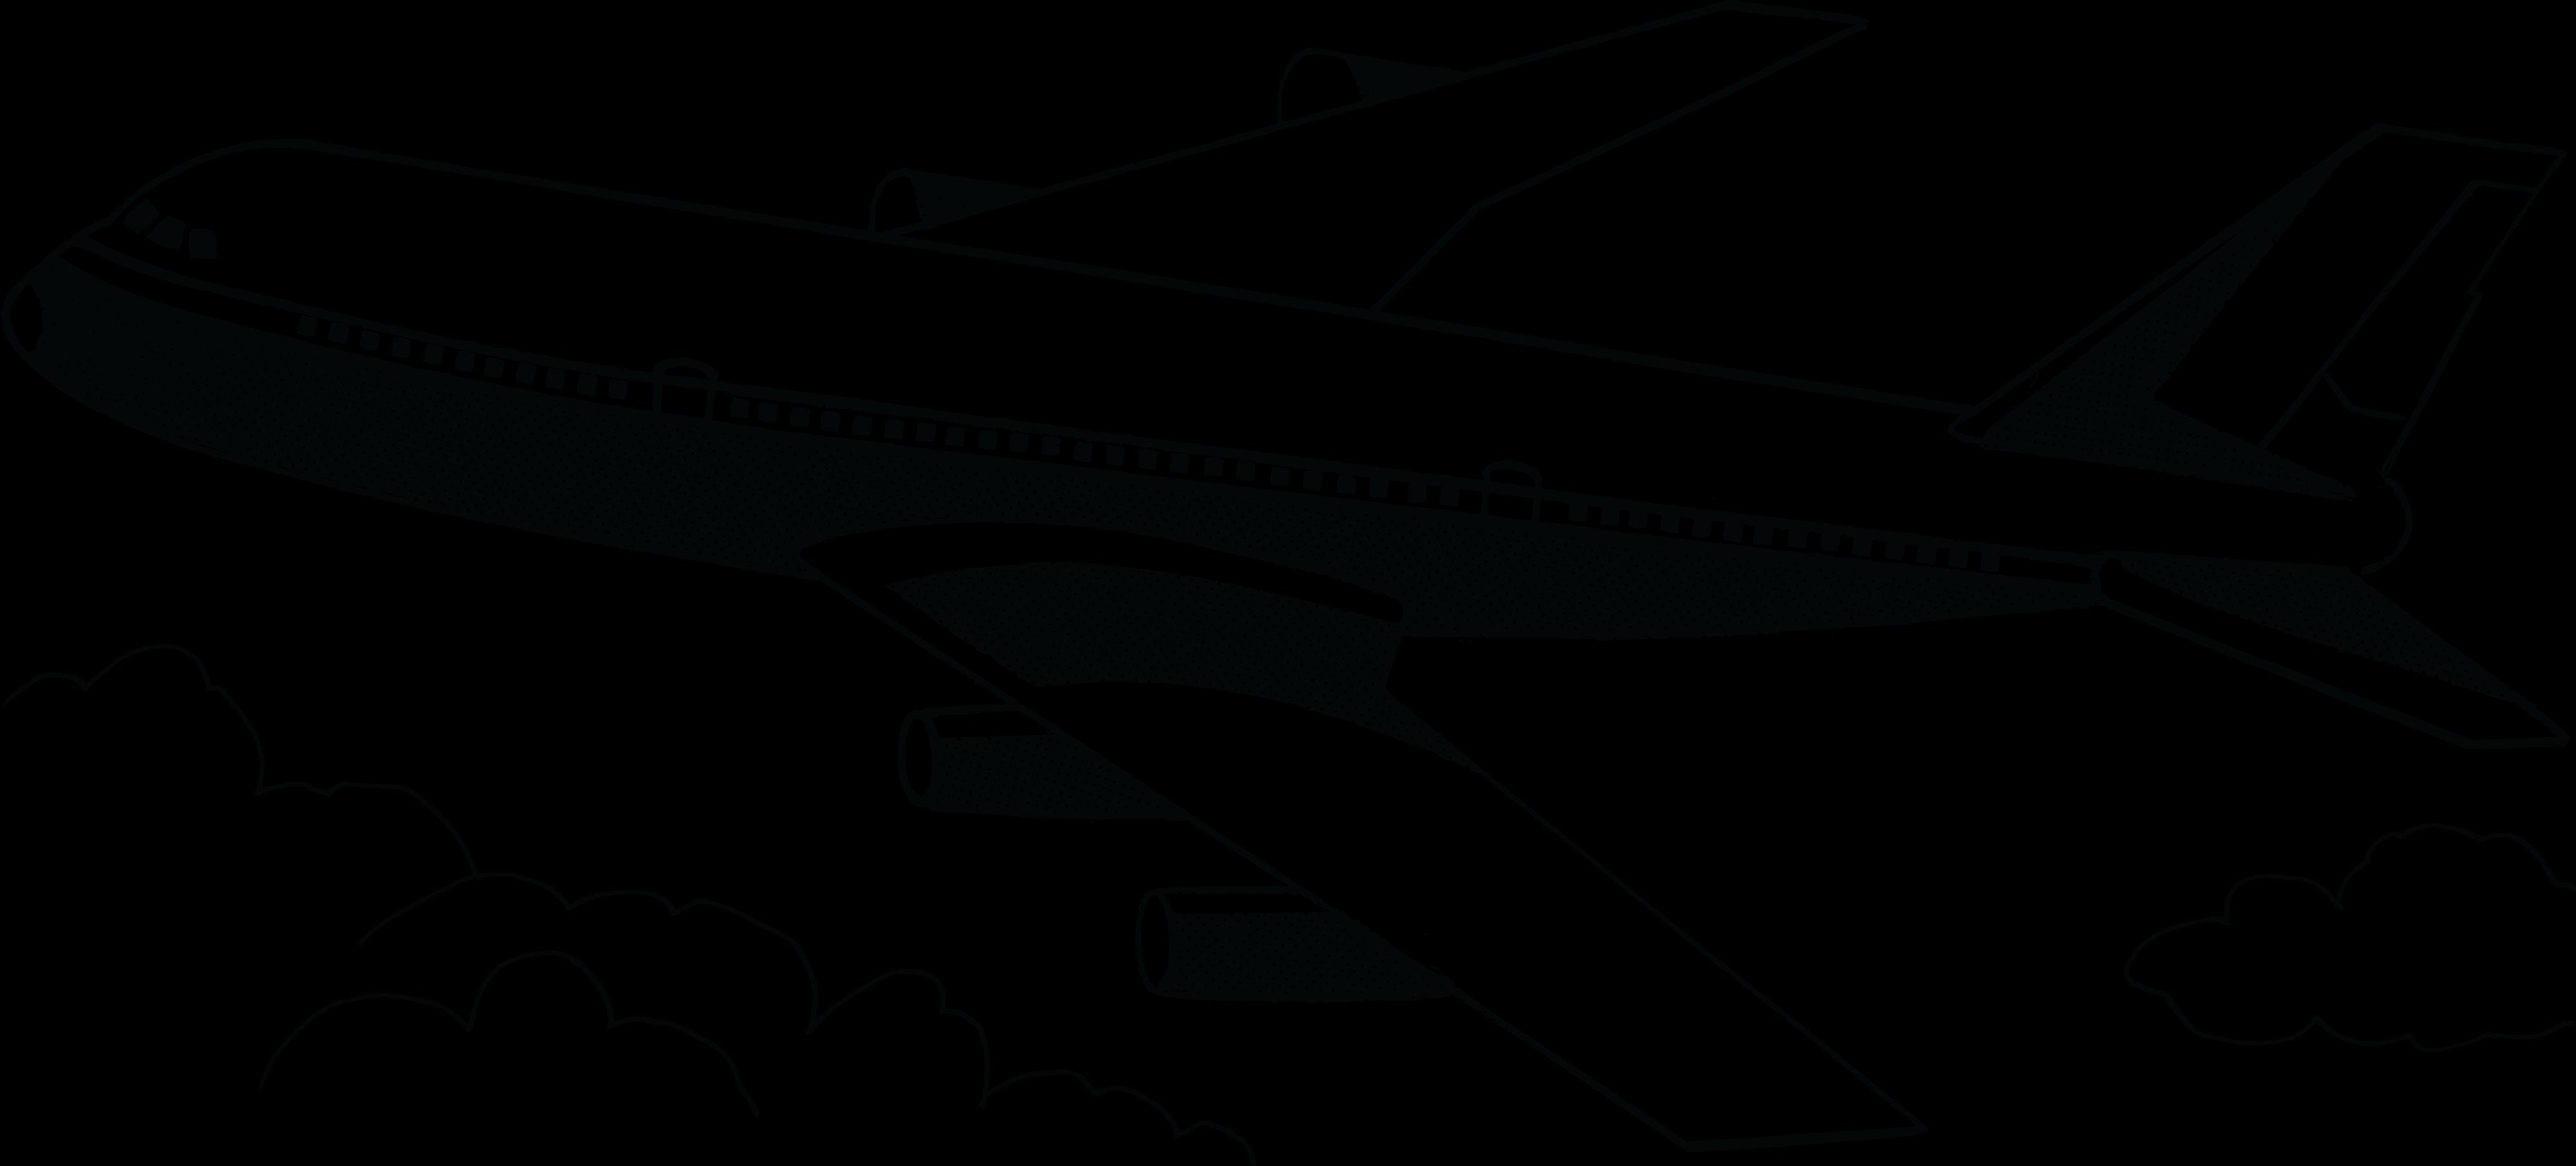 Plane Png Clipart.